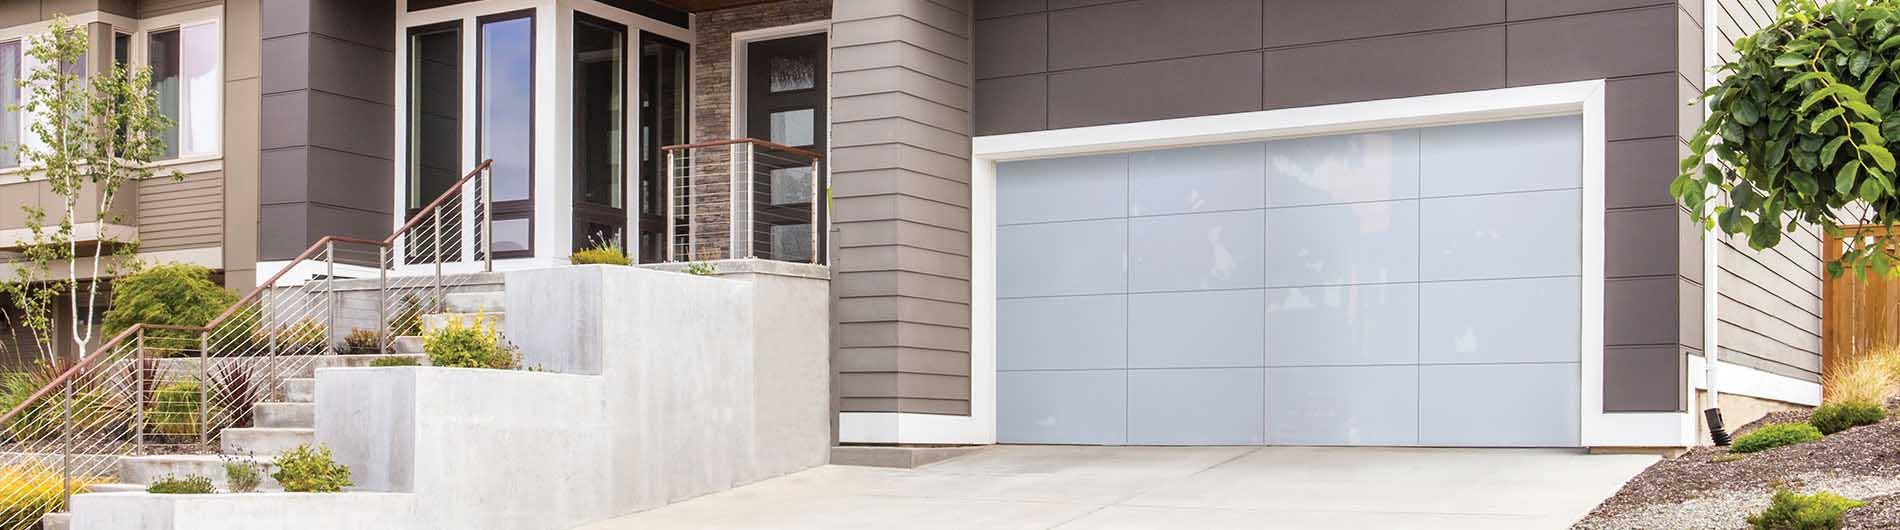 Aluminum Glass Garage Doors 8450